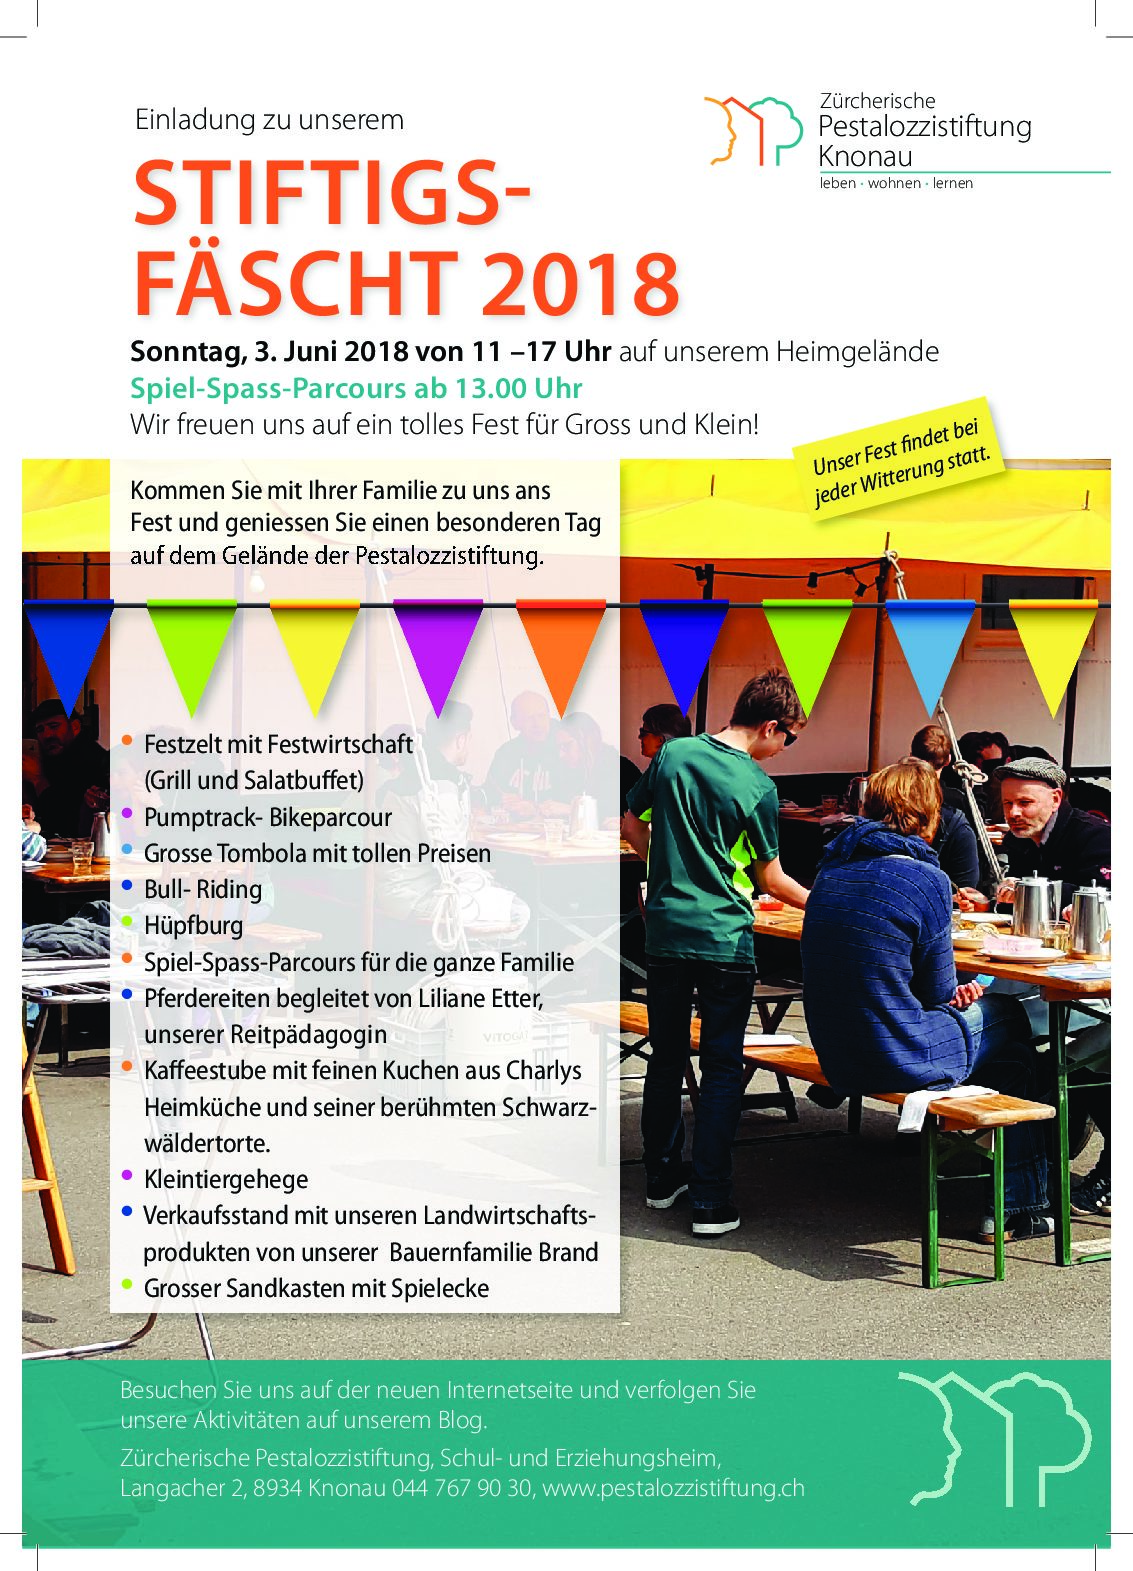 Stiftigs-Fäscht 2018